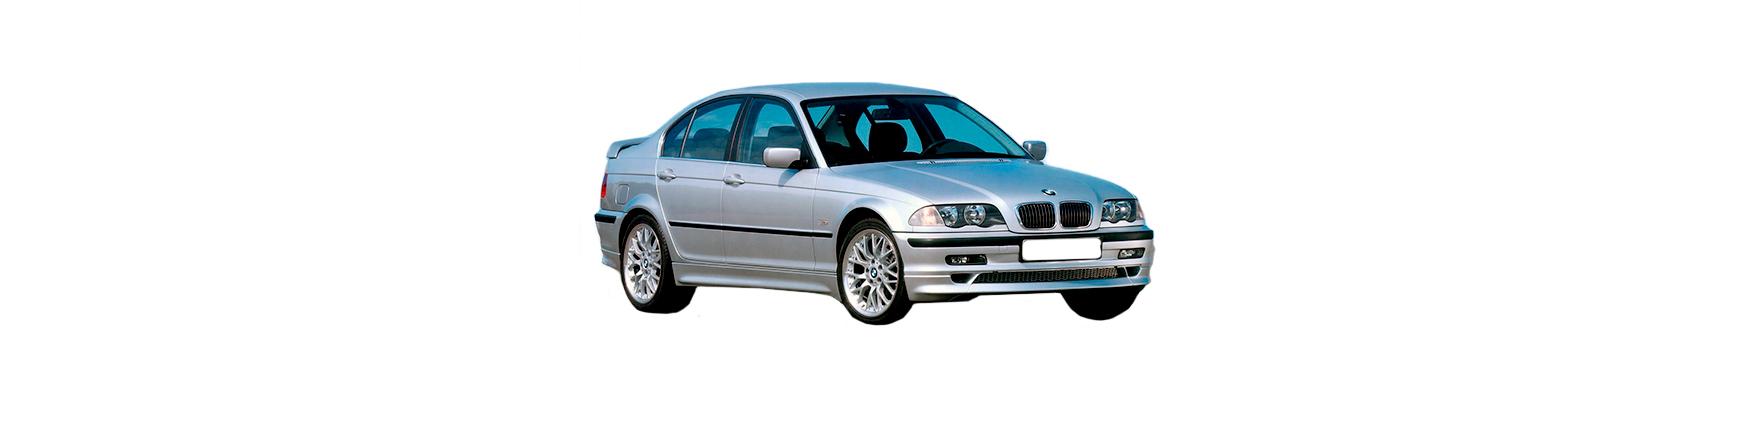 Recambios de bmw serie 3 e46 modelos 1998, 1999, 2000, 2001.